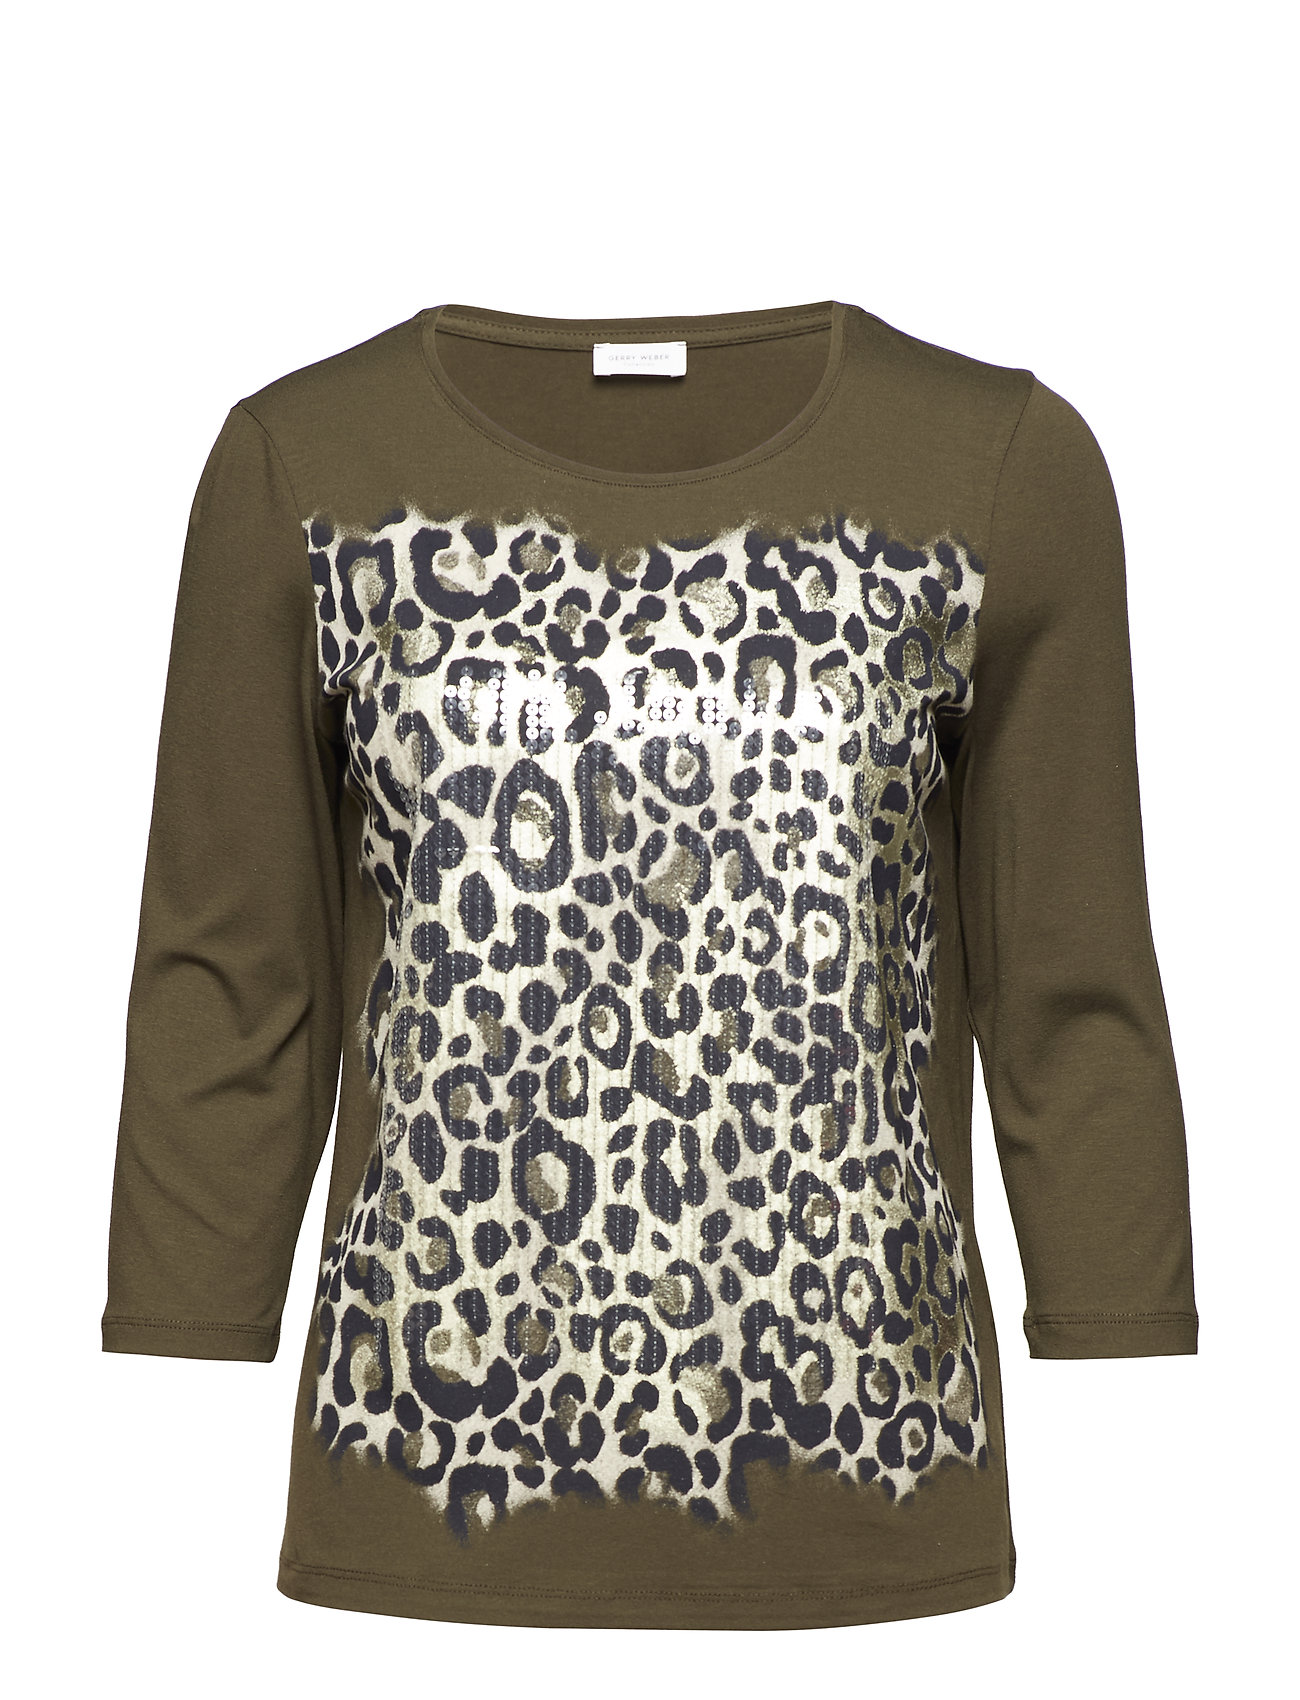 Image of T-Shirt 3/4-Sleeve R Langærmet T-shirt Multi/mønstret GERRY WEBER (3067487305)